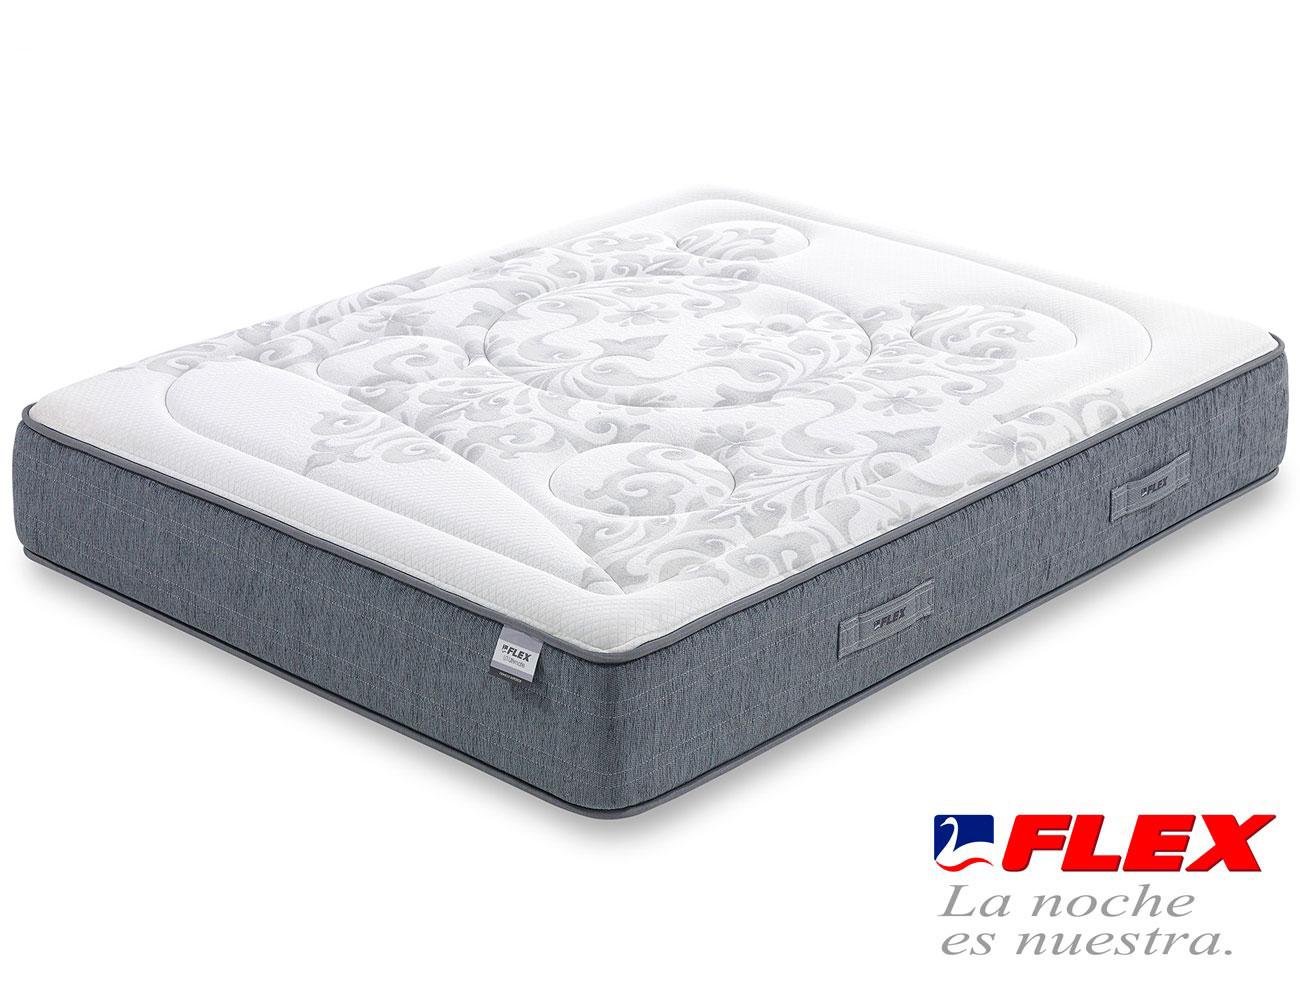 Colchon flex airvex viscoelastica gel garbi superior2